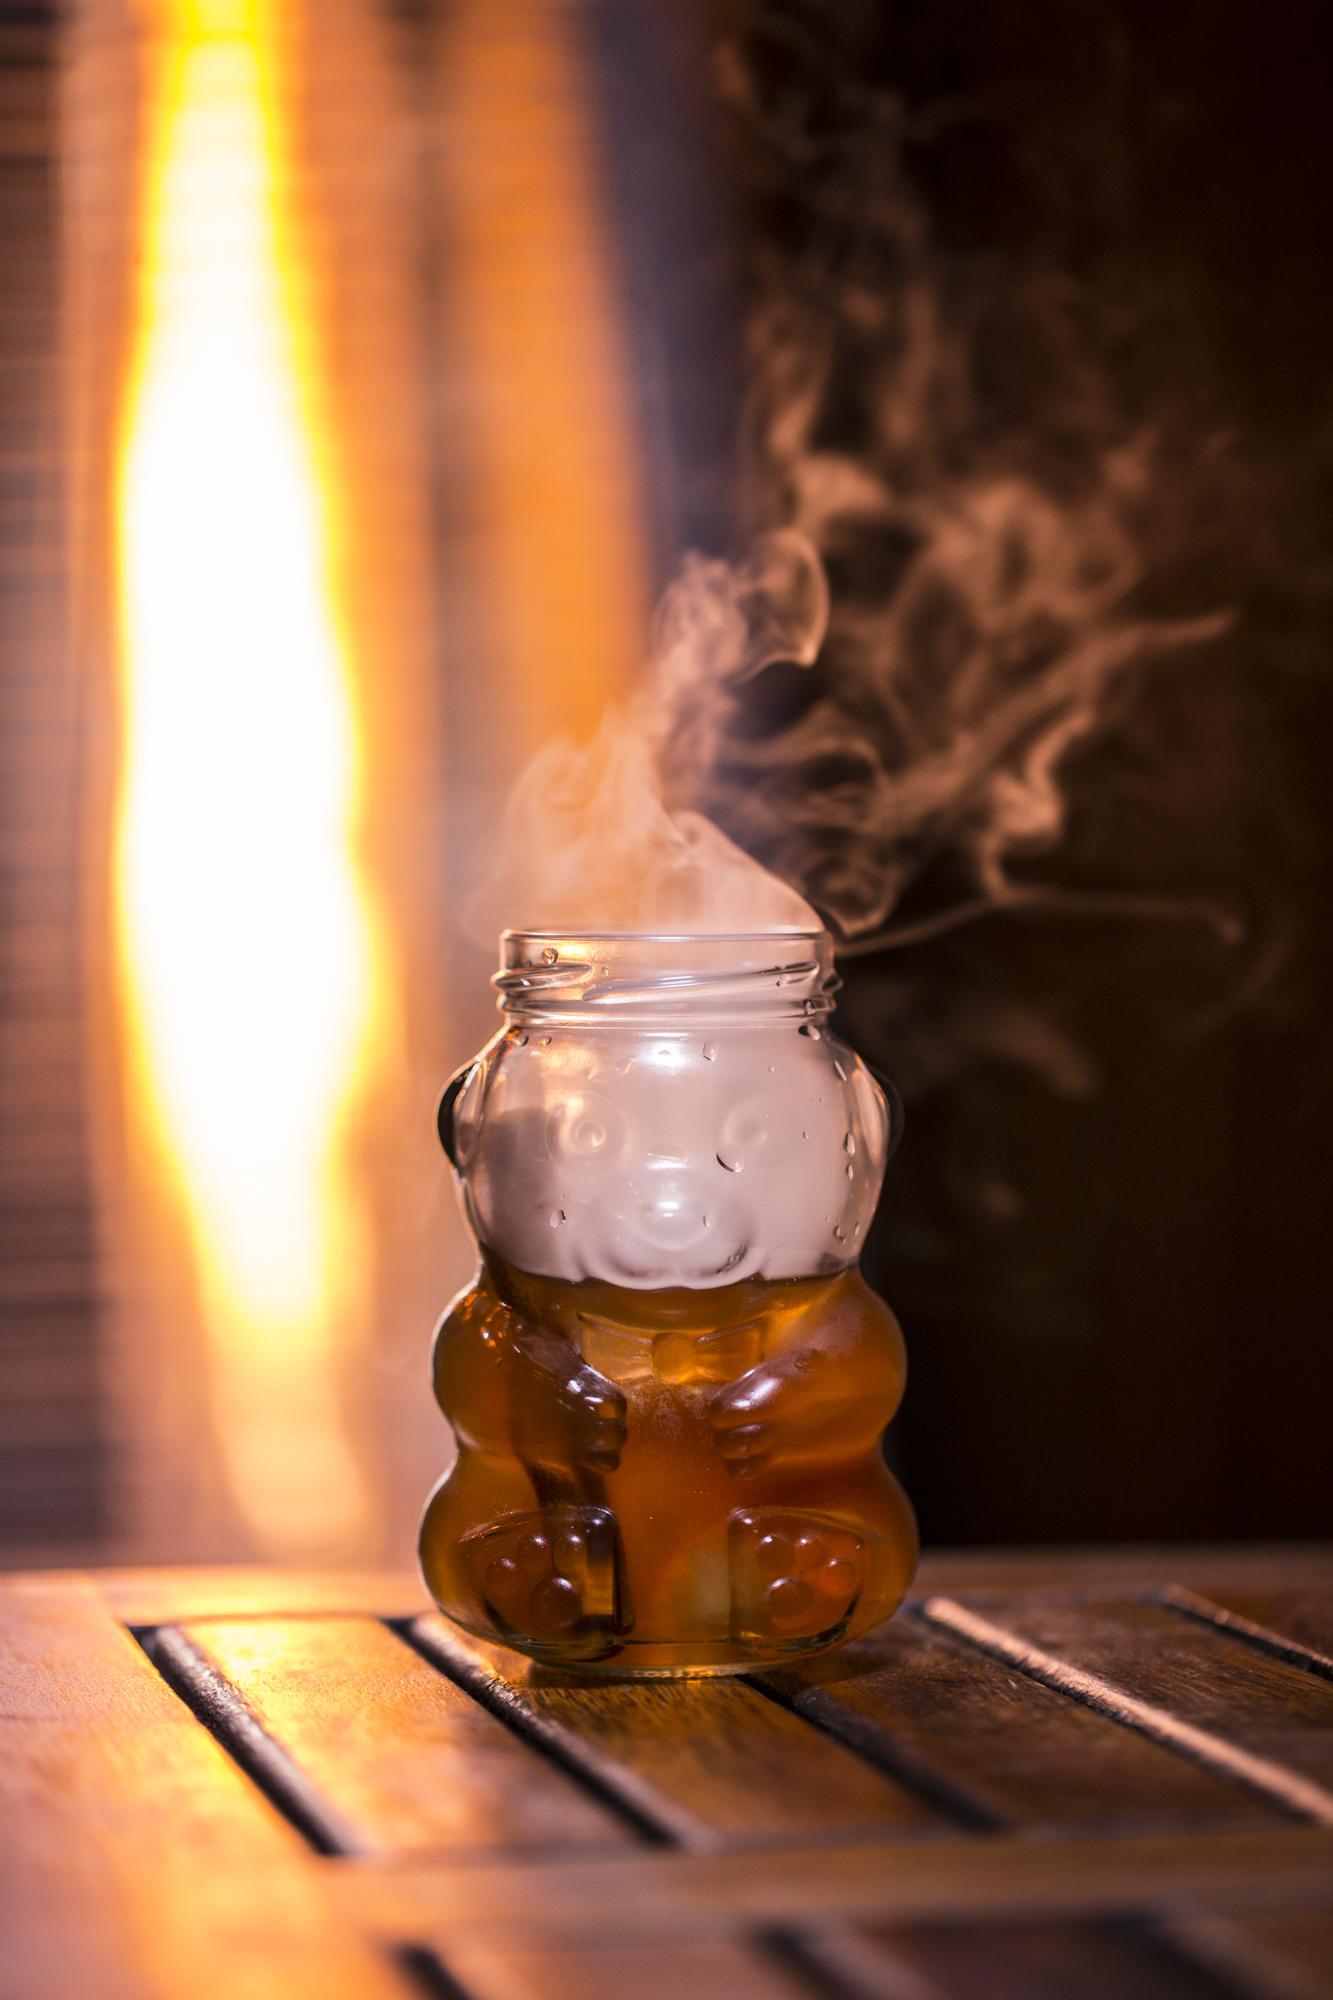 smokeyandthebear